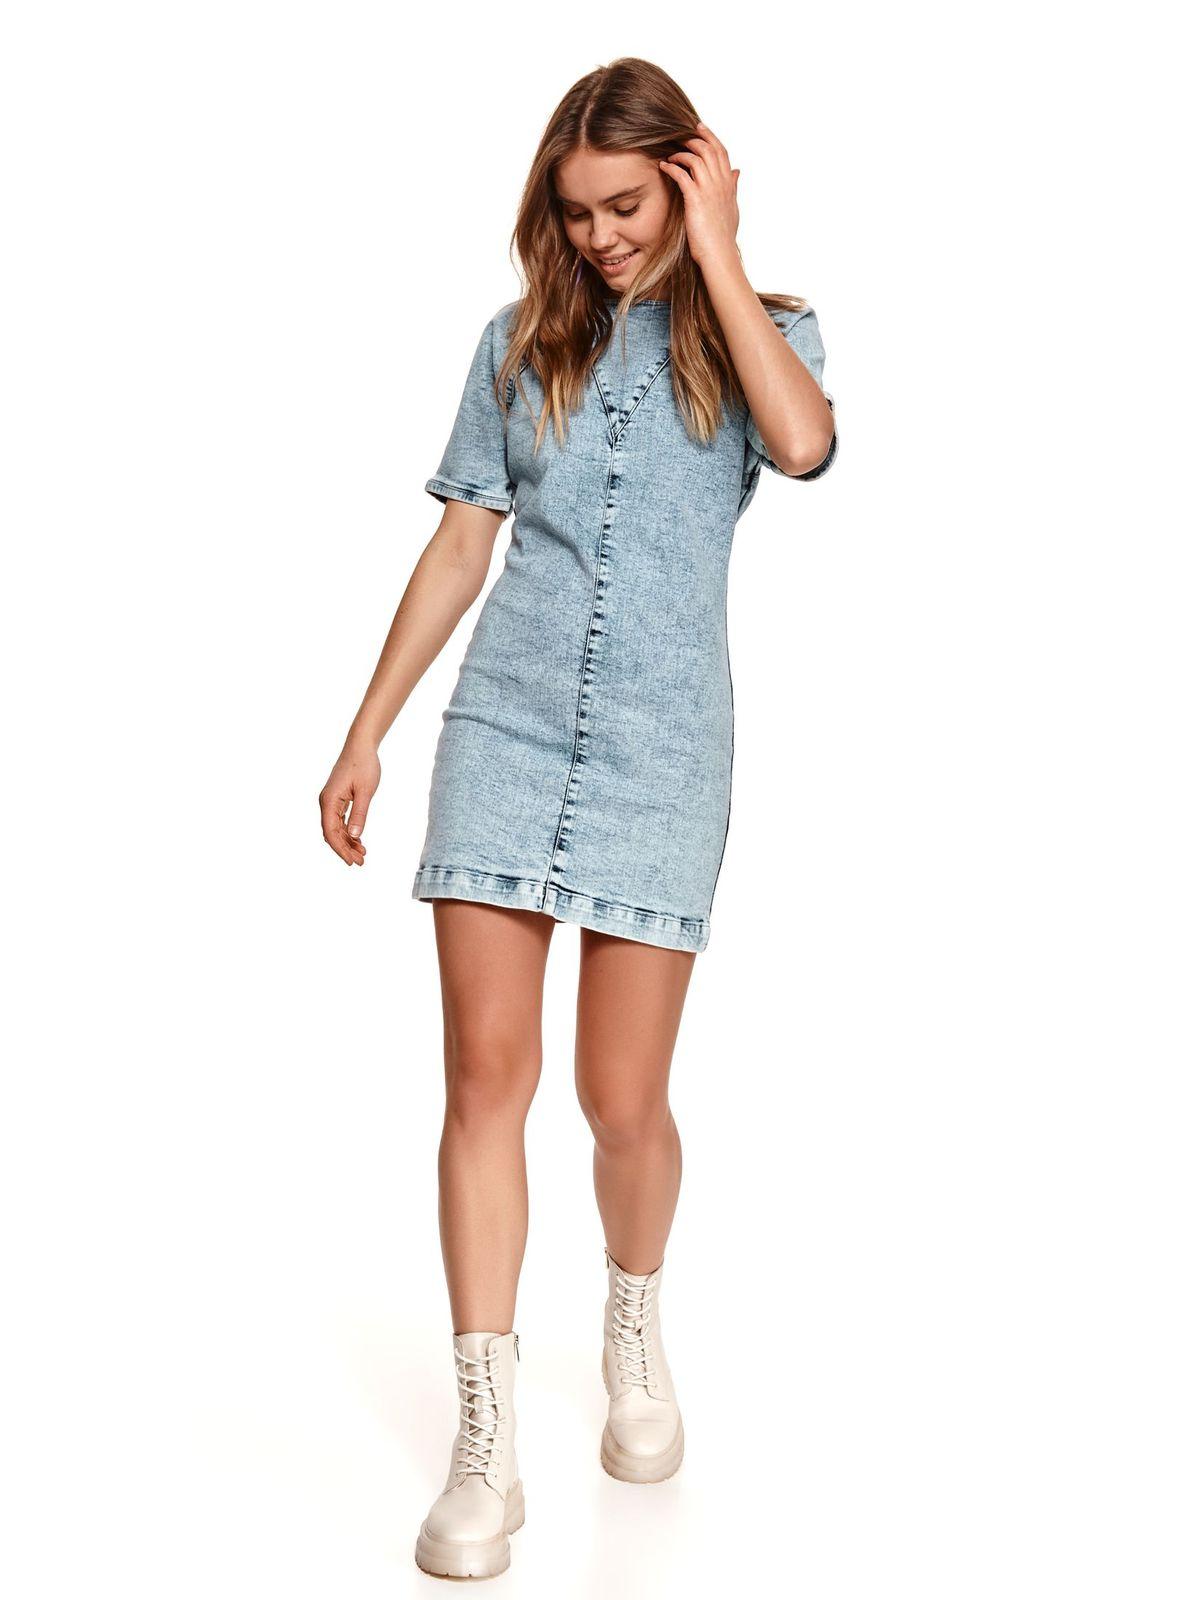 Lightblue dress short cut pencil top wrinkled sleeves